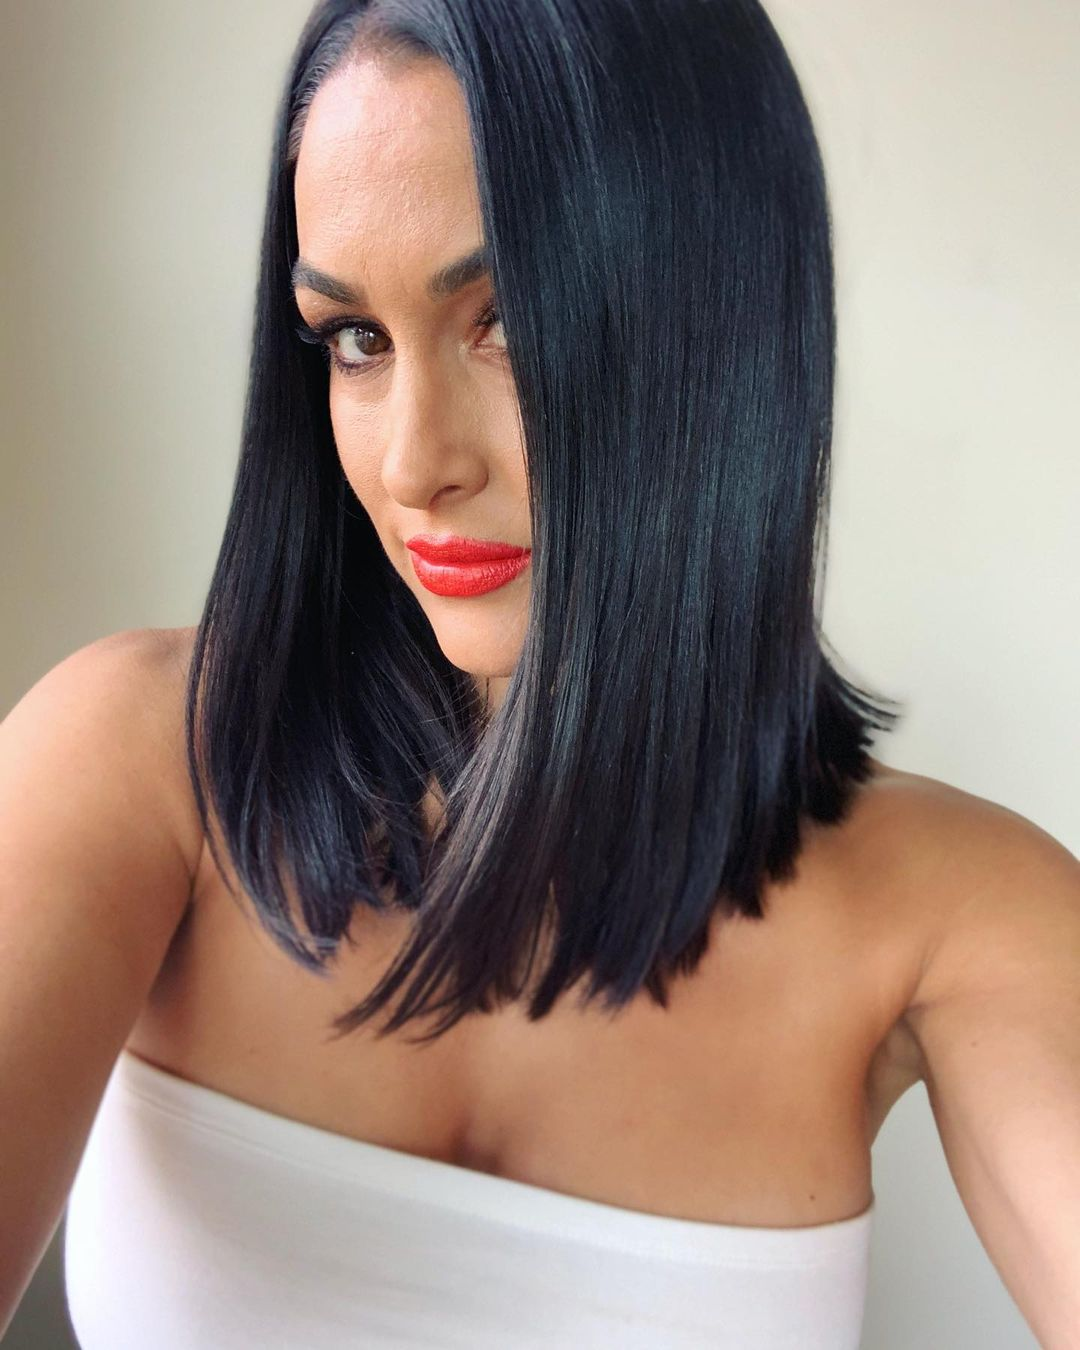 Photos: WWE Star Nikki Bella Shows Off New Hair Makeover 19